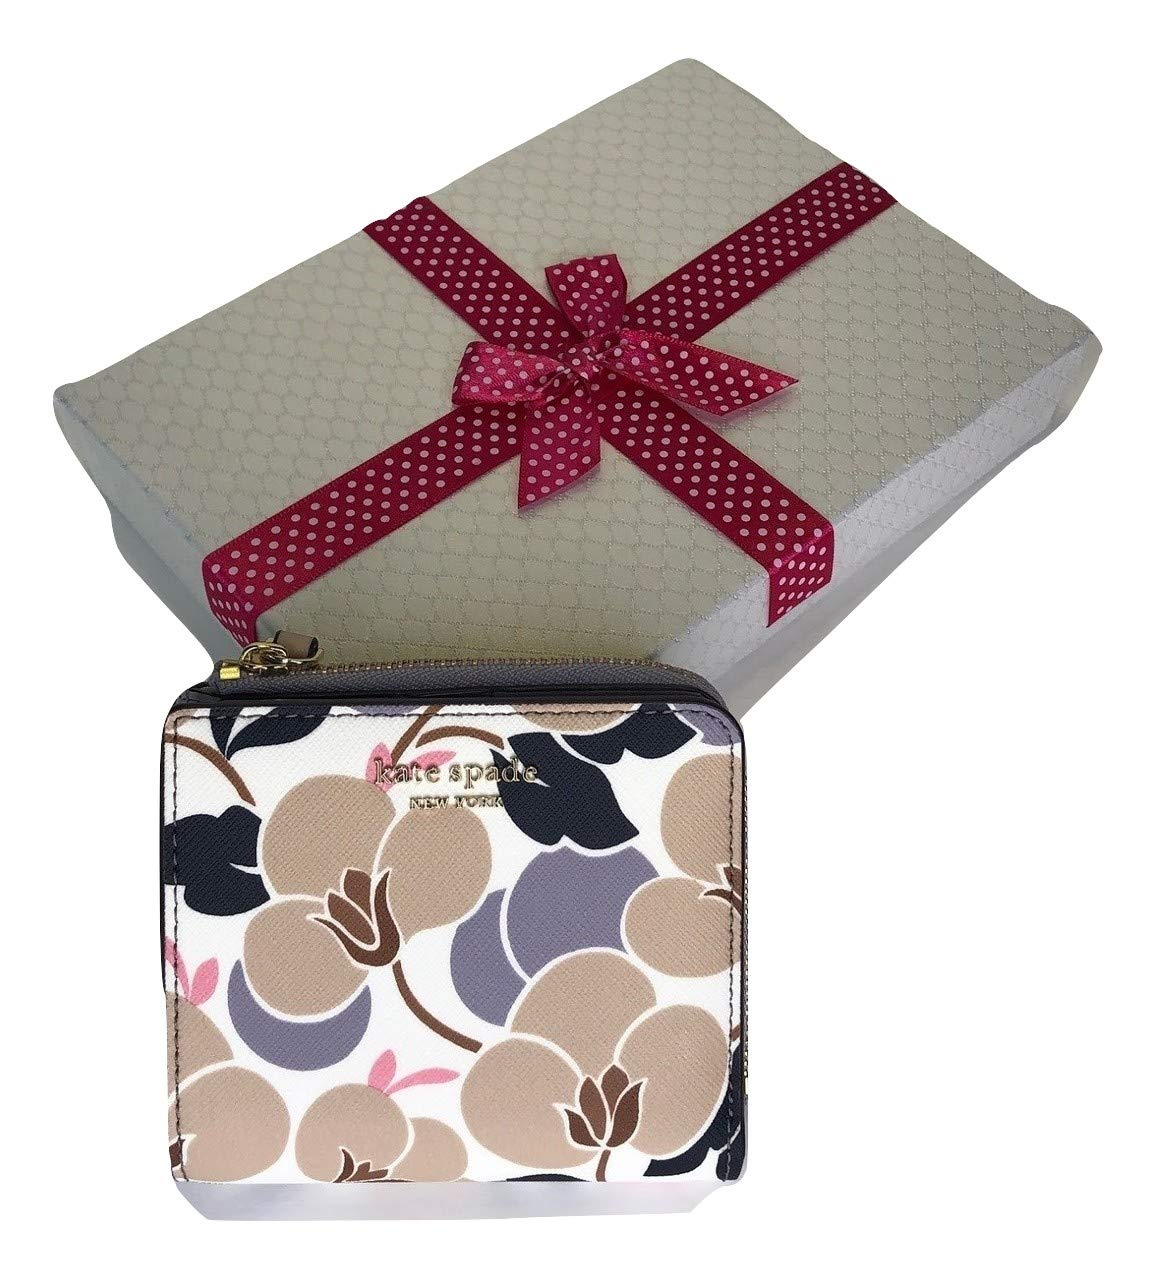 Kate Spade New York Small Bifold Wallet (Cameron WLRU5410 Breezy Floral)